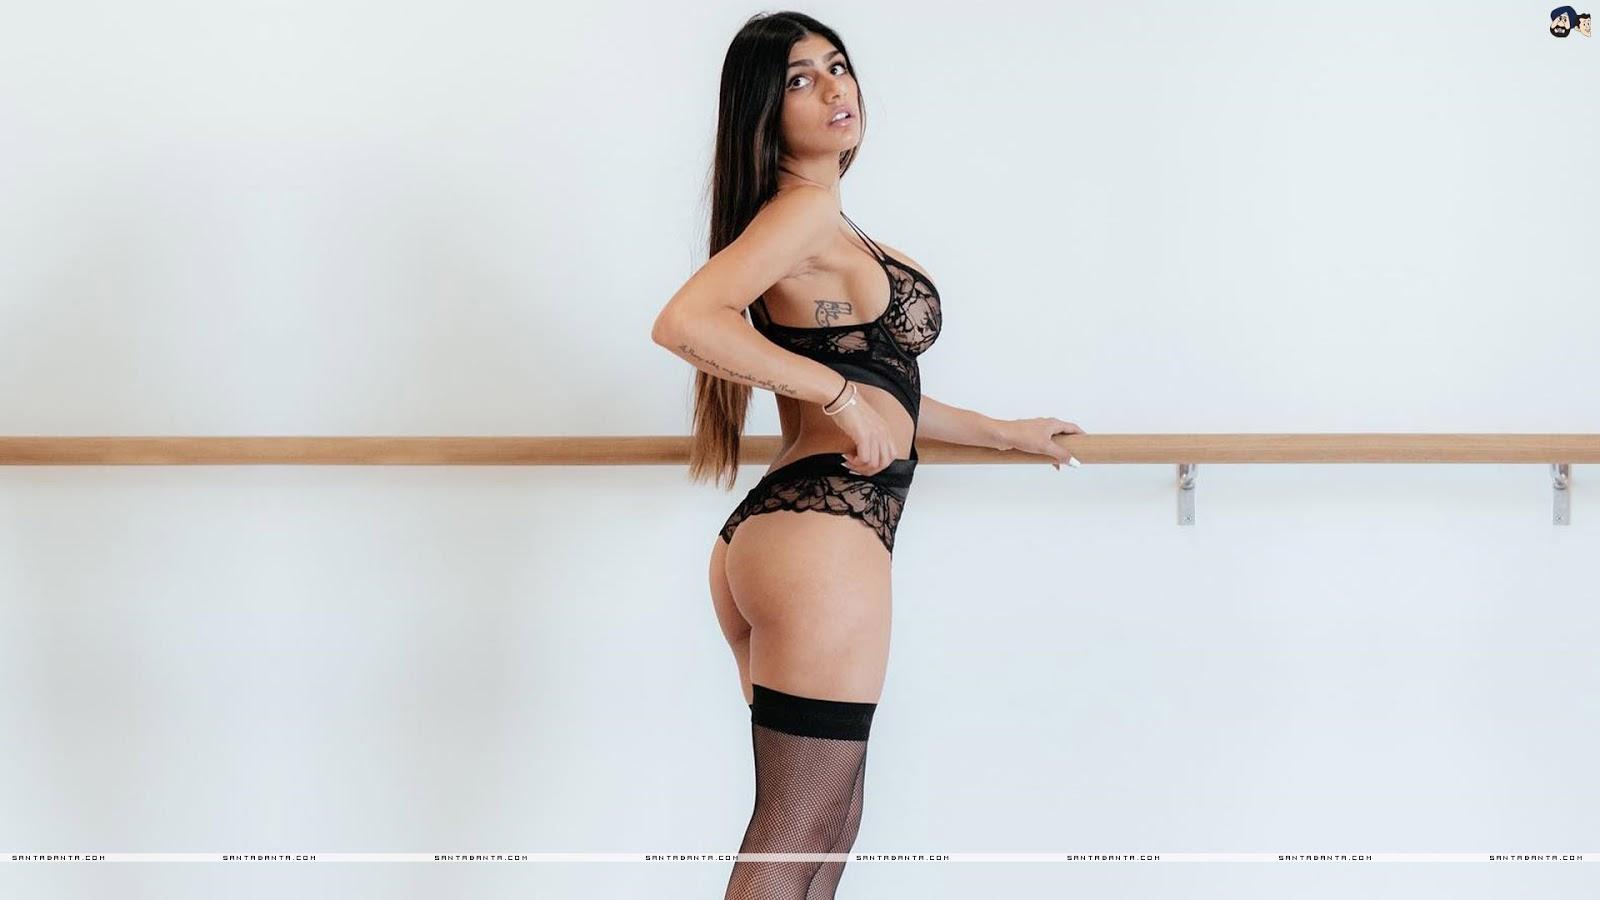 Mia Khalifa Latest Sexy Wallpaper